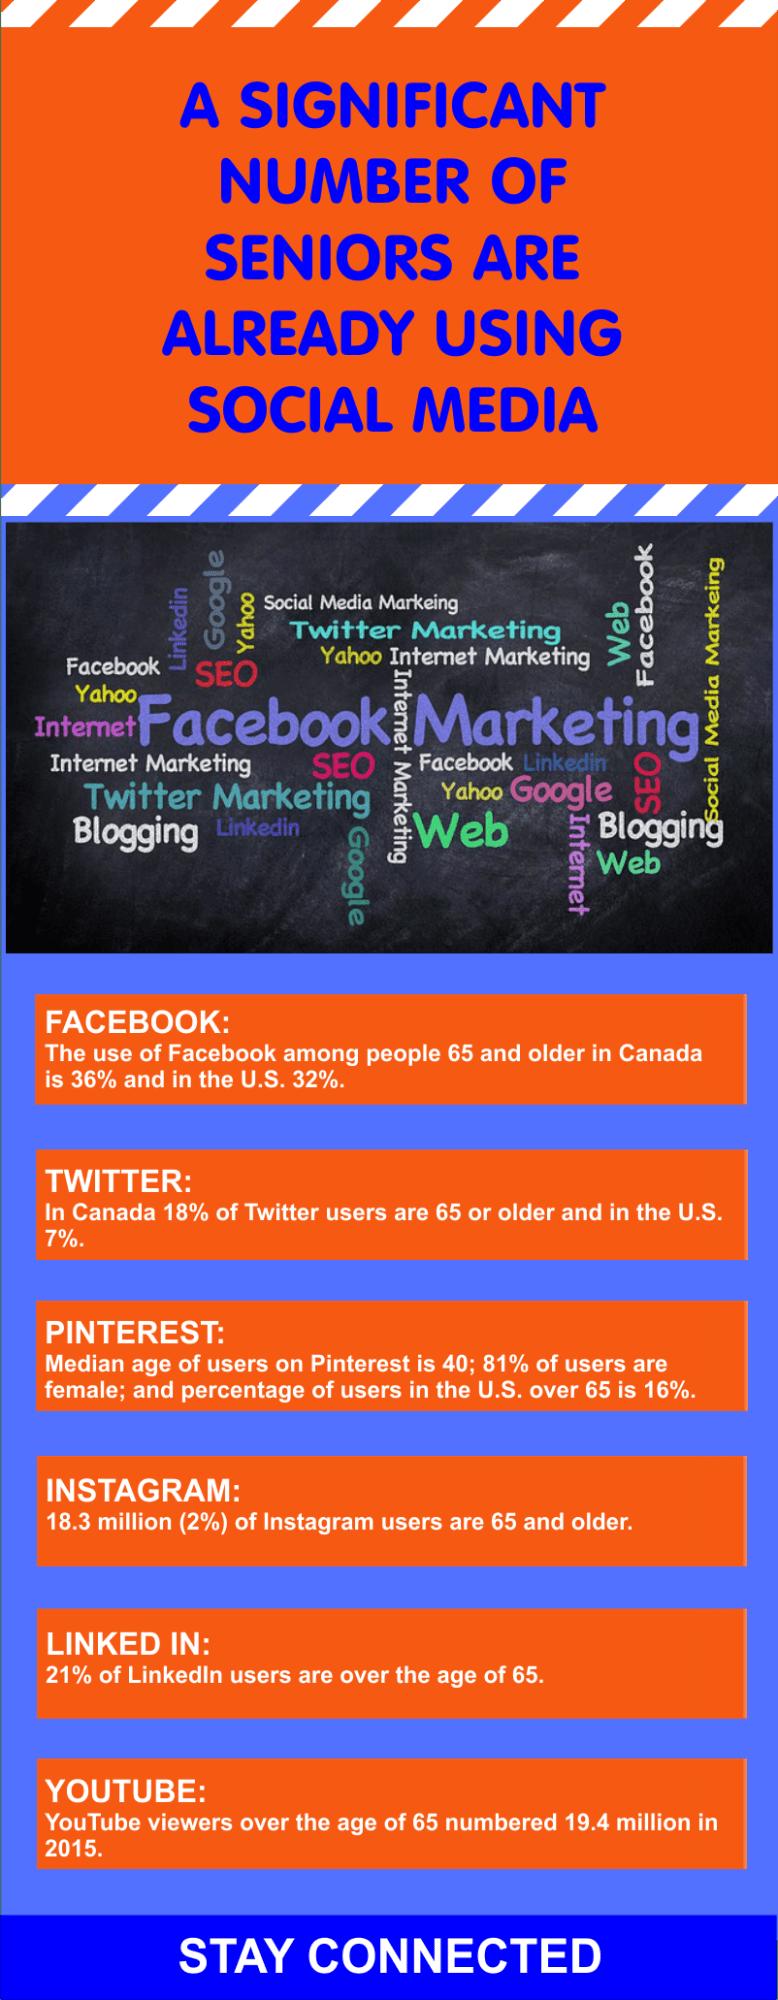 Social Media Statistics for Seniors